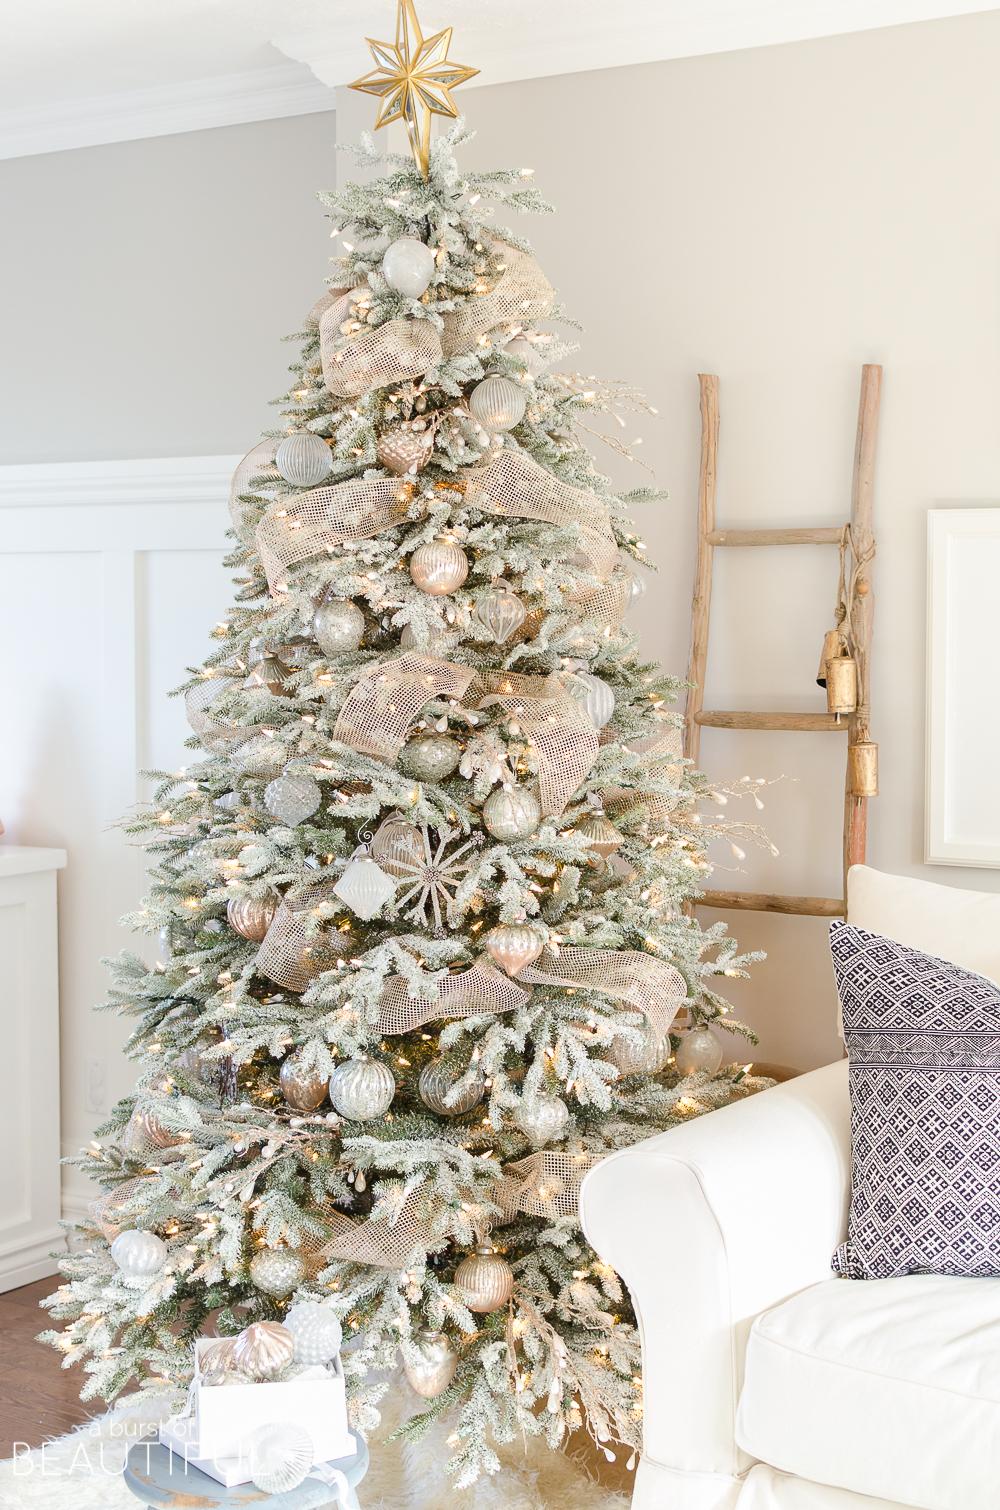 A-Snowy-Flocked-Christmas-Tree-4930.jpg